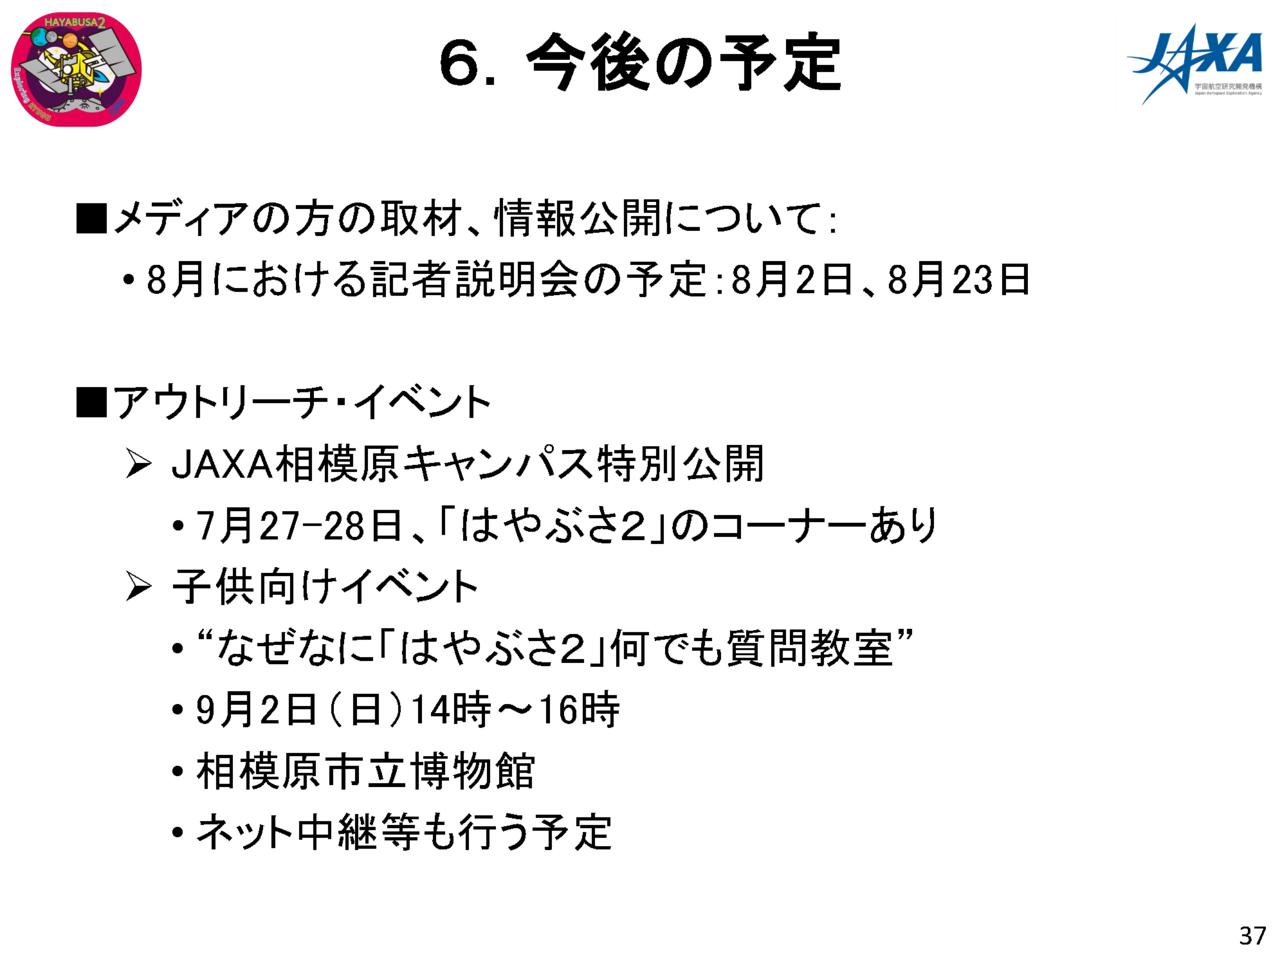 f:id:Imamura:20180719131732p:plain